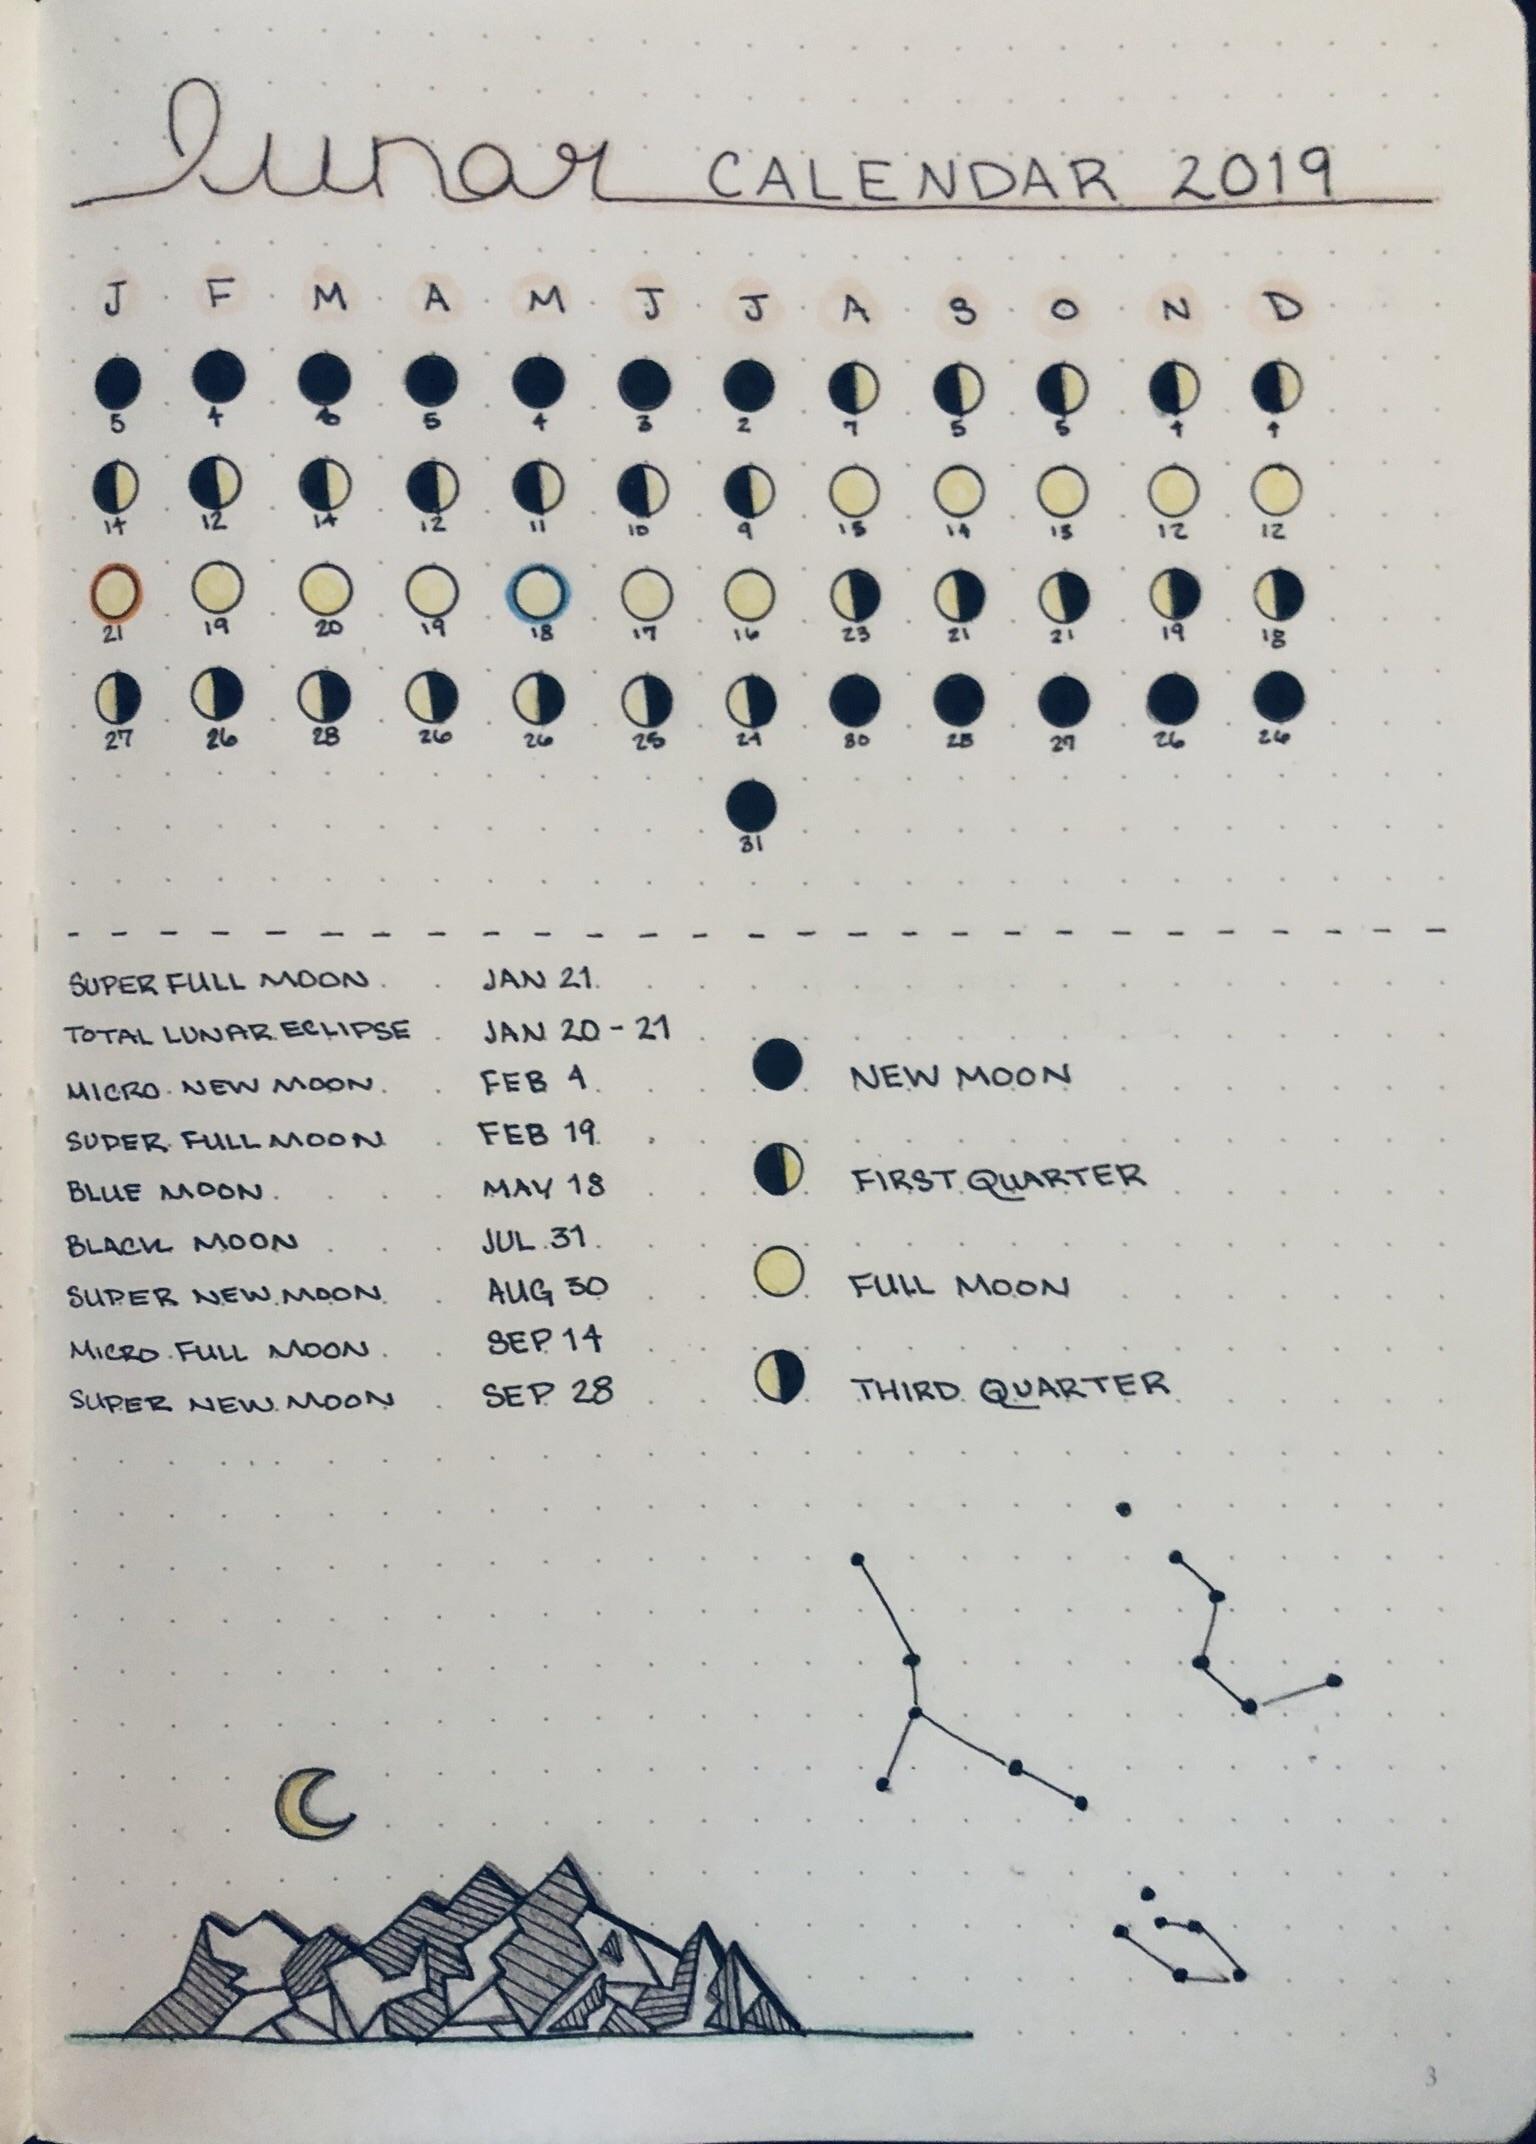 Lunar Calendar For 2019 : Bujo Calendar 2019 Moon